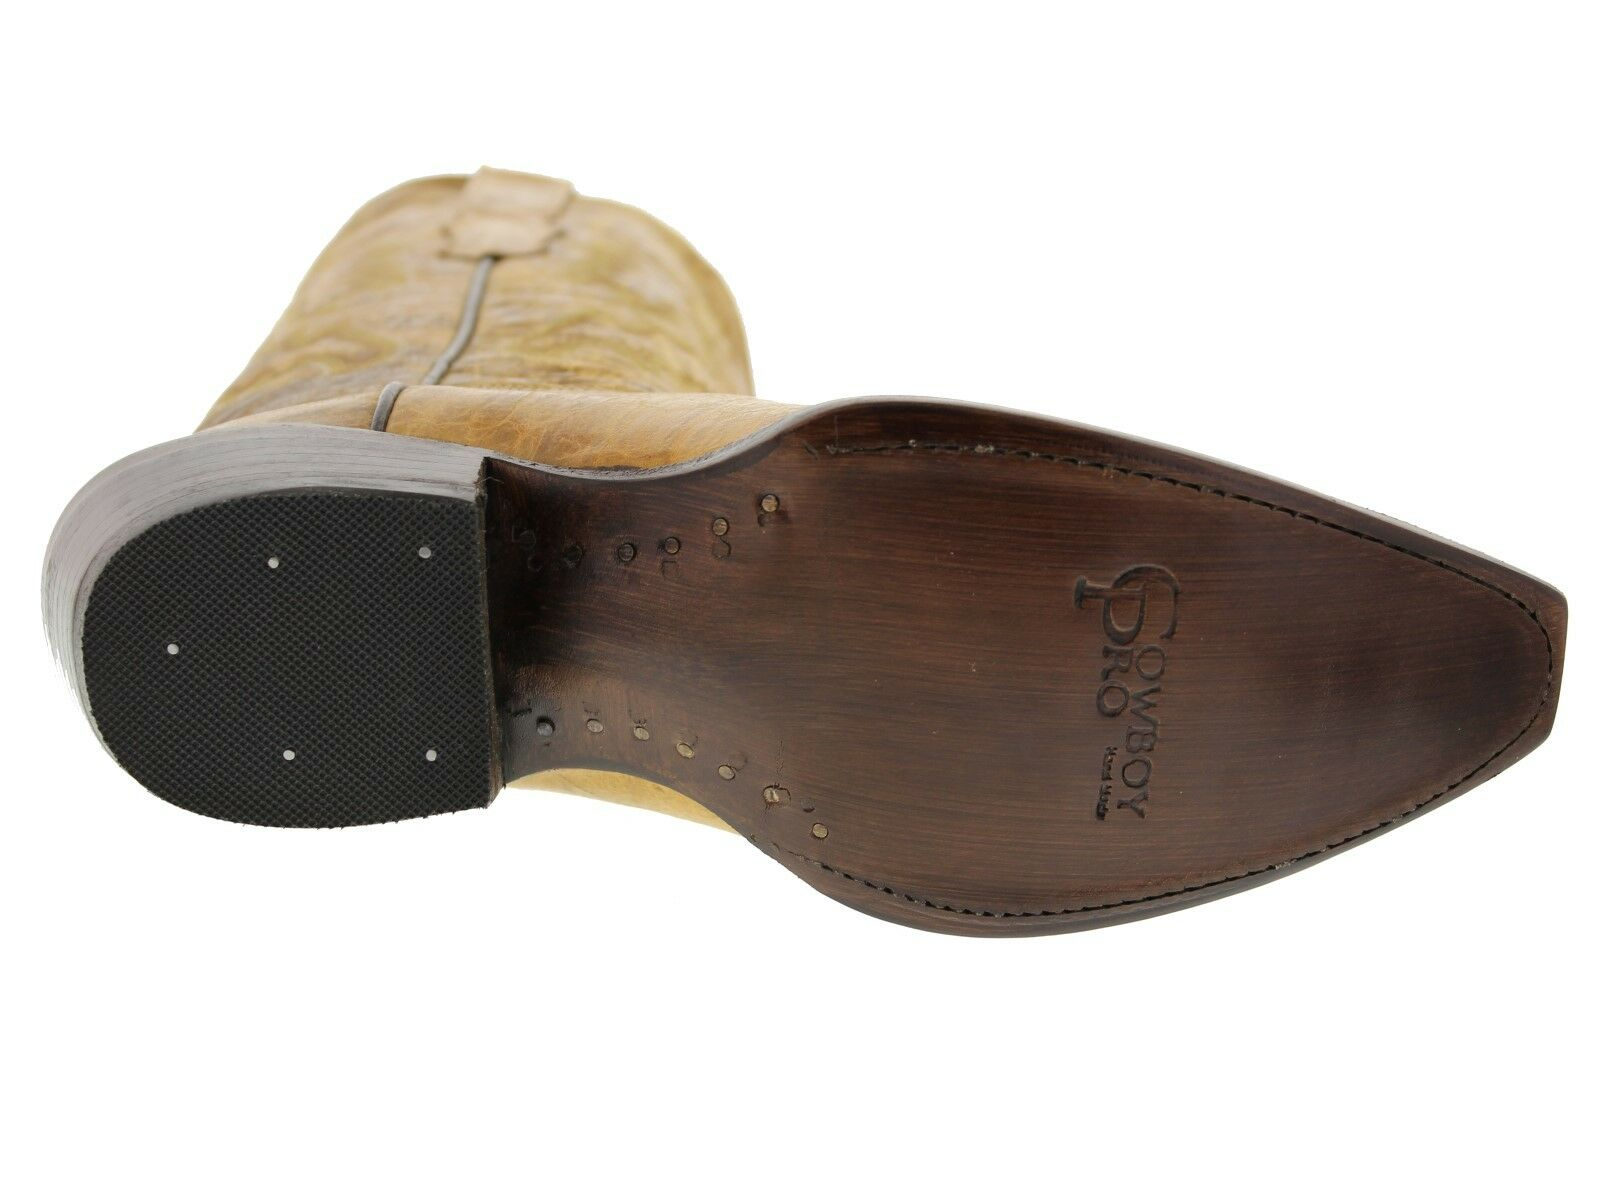 Donna Tanned Plain Classic Western Casual Style Cowboy Stivali Plain Tanned Pelle e488b5